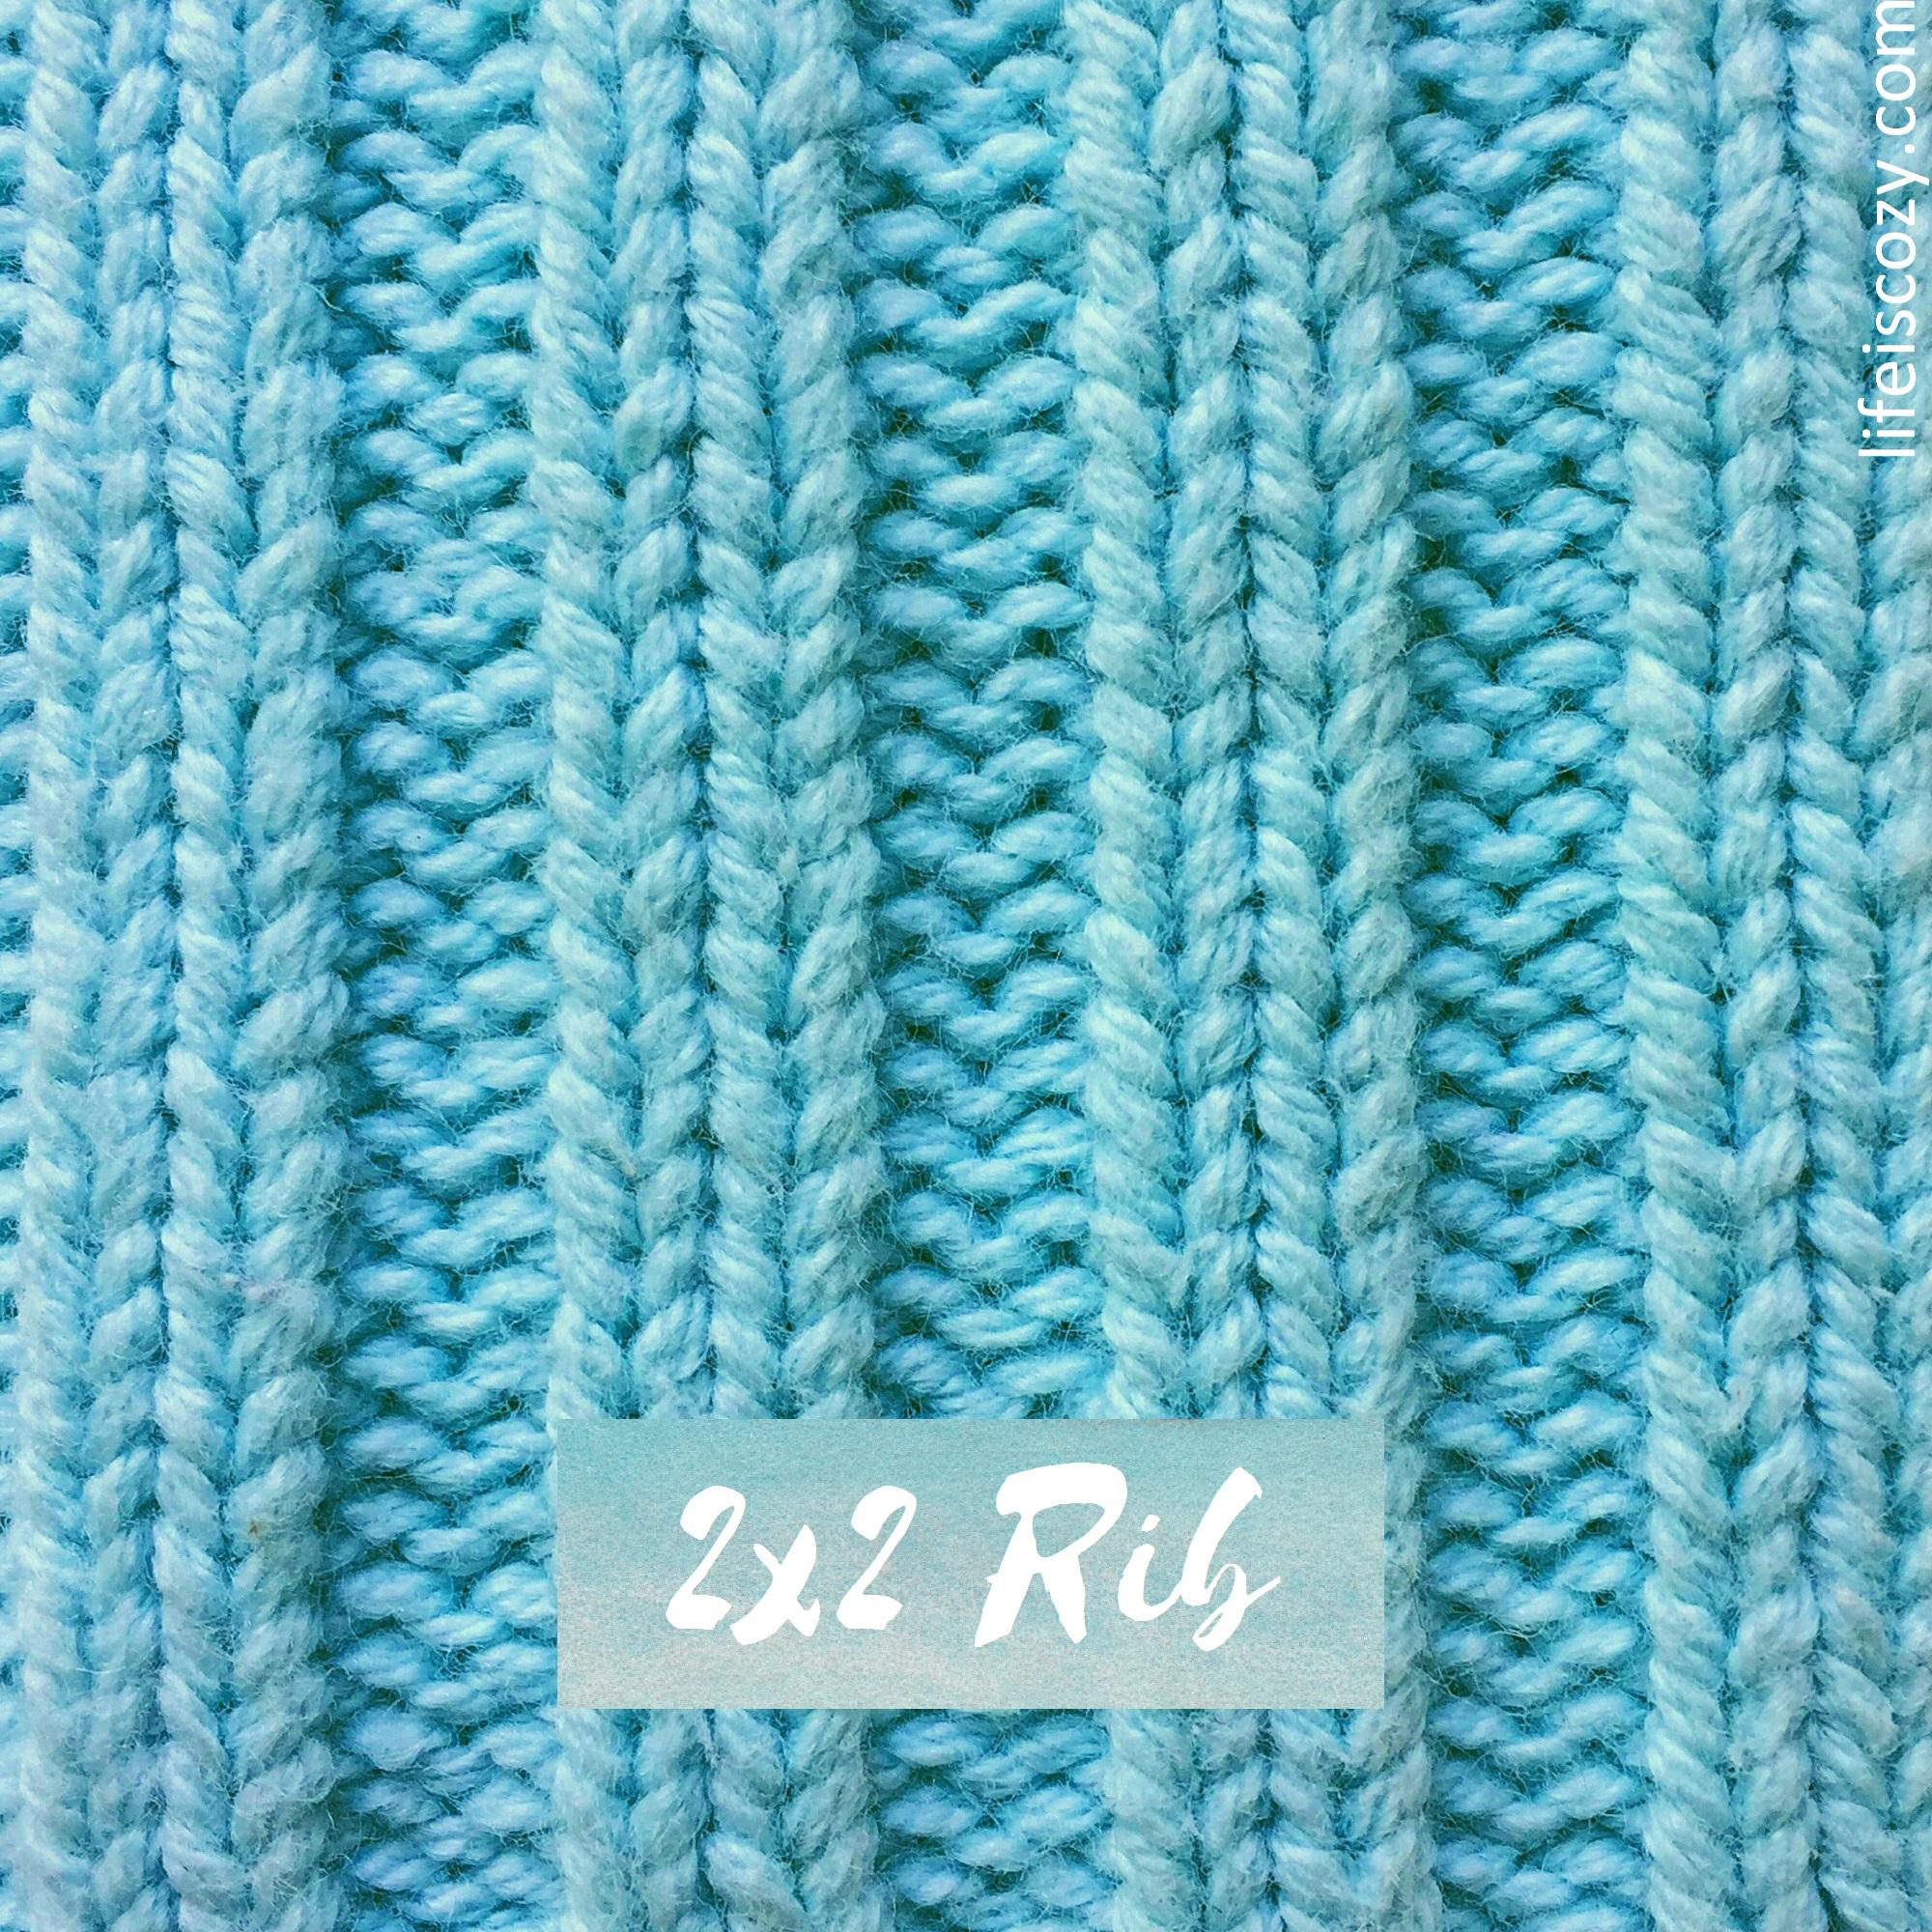 2x2 Rib Stitch Simple Ribbing How to knit